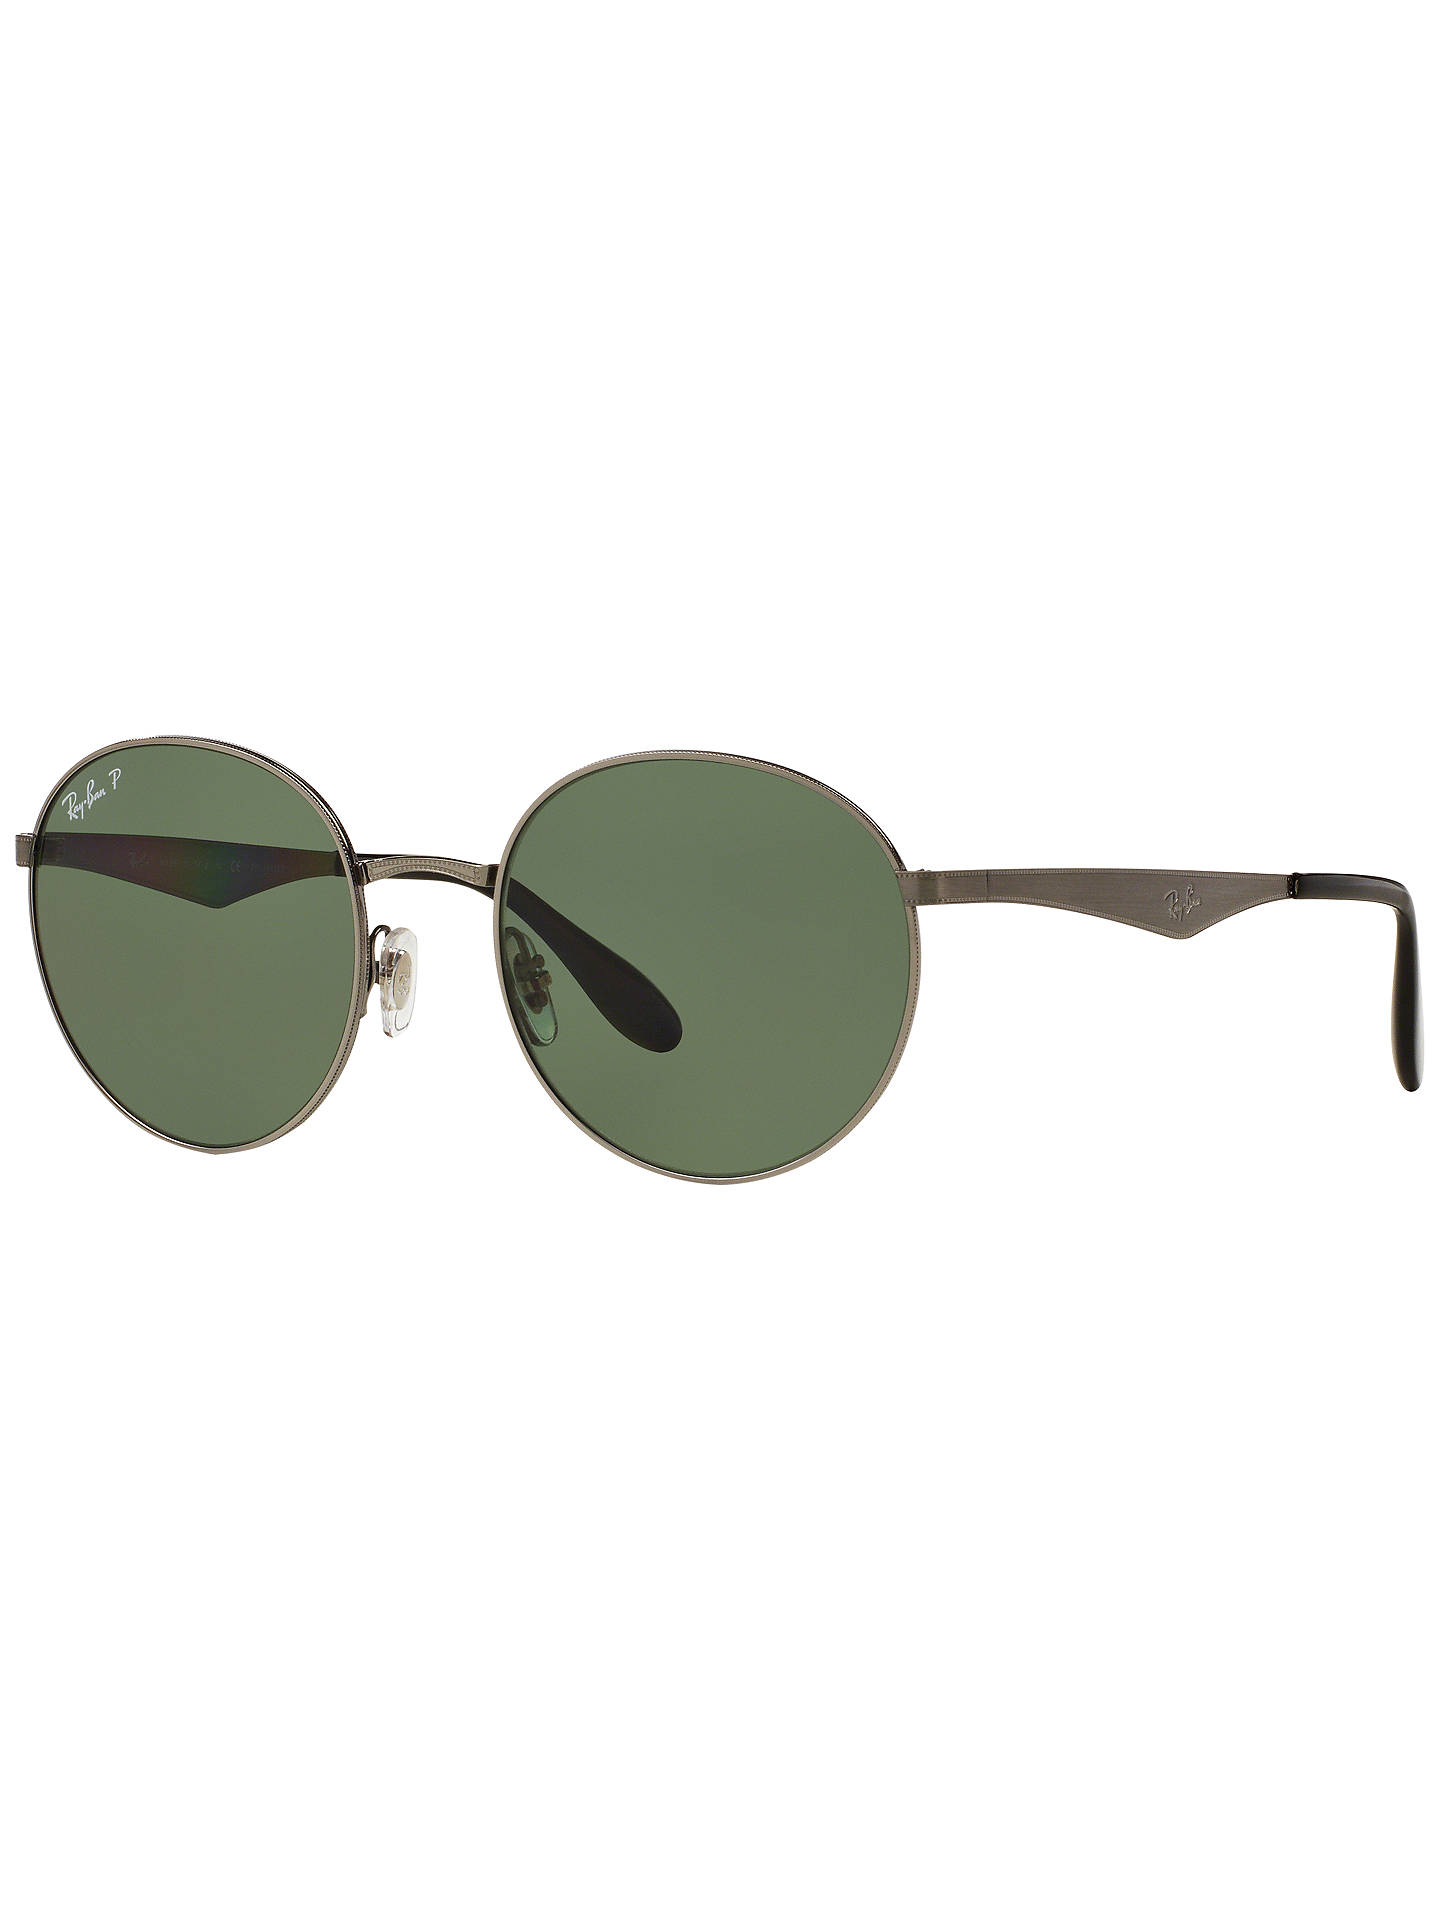 f60ac2dccb BuyRay-Ban RB3537 Highstreet Polarised Round Sunglasses